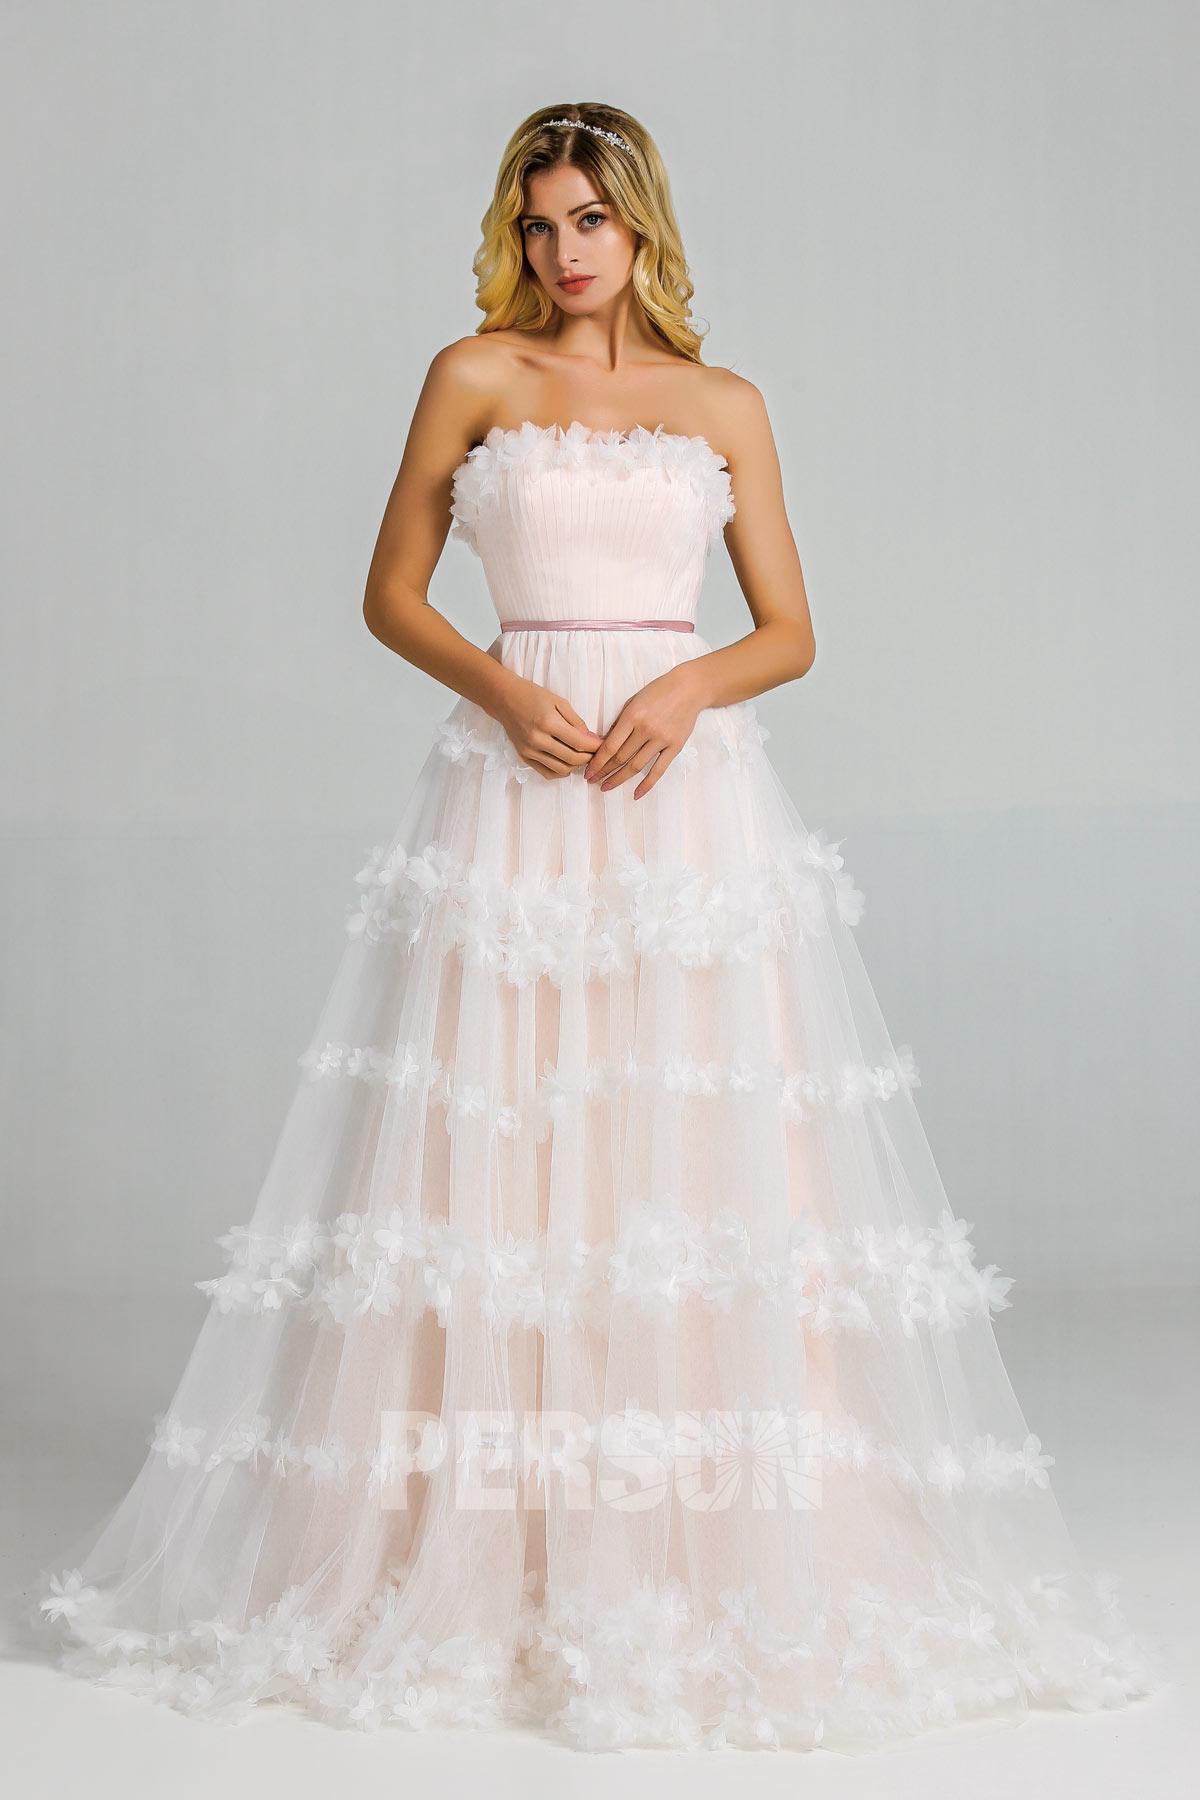 robe de mariée rose bustier embelli de fleurs 3D